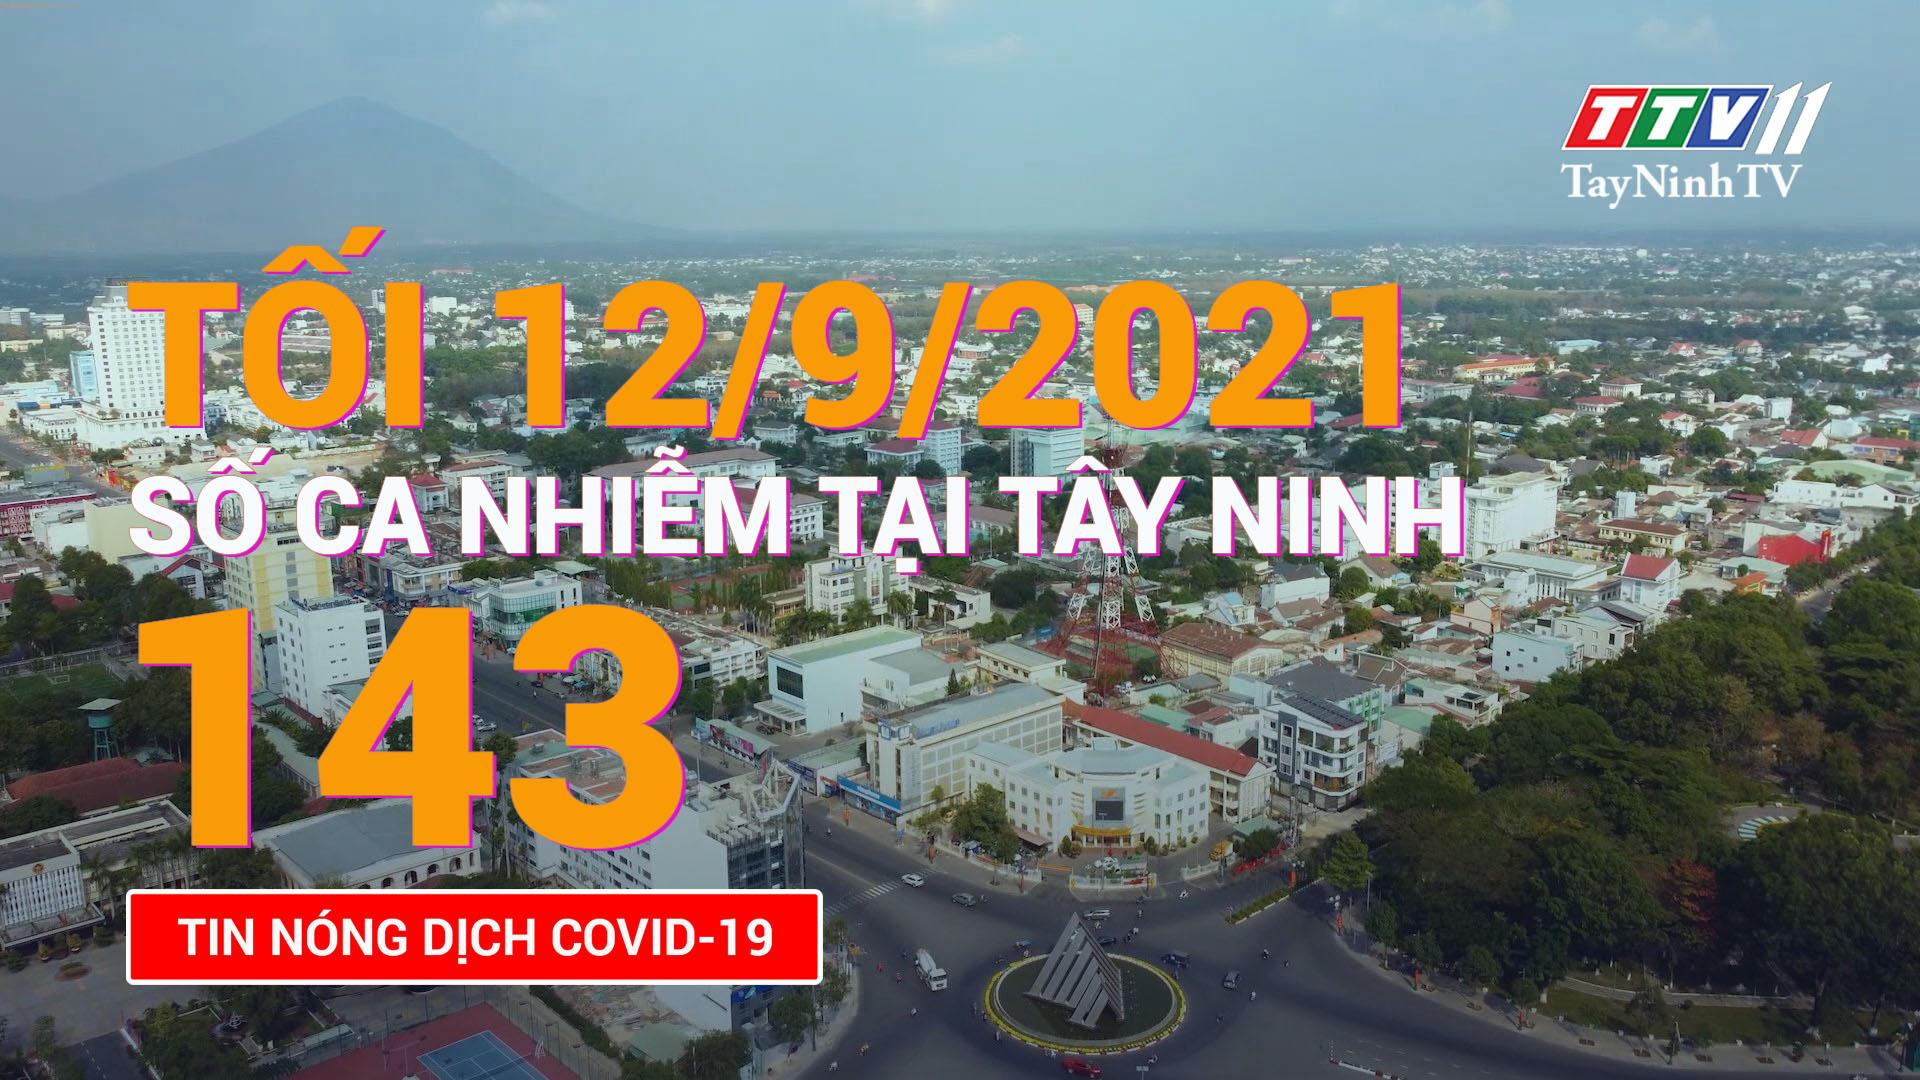 Tin tức Covid-19 tối 12/9/2021 | TayNinhTV